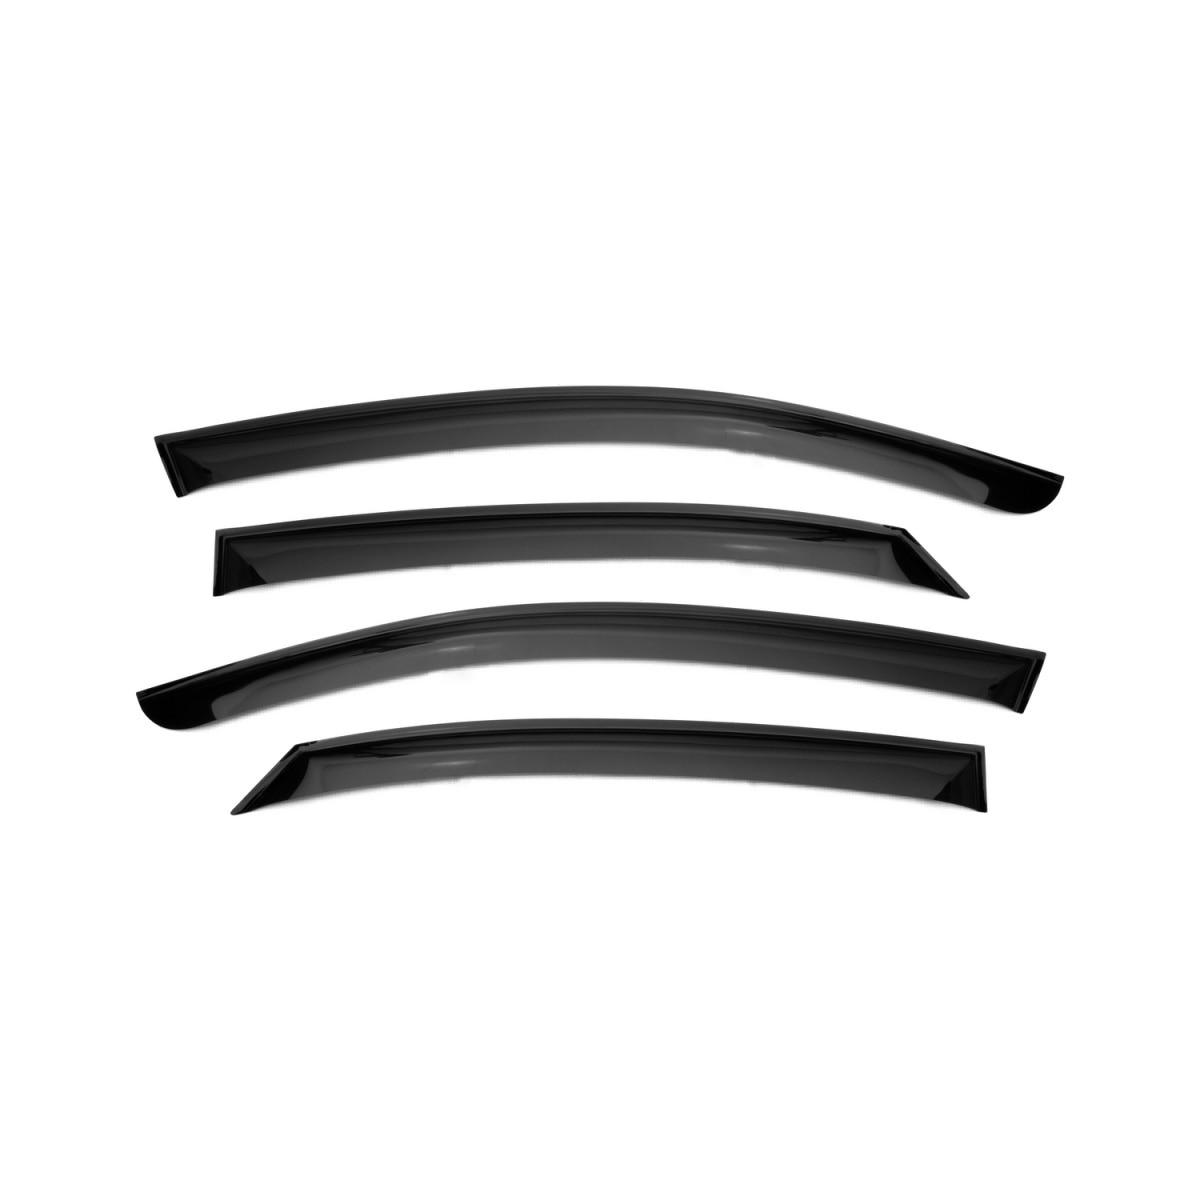 Window Deflector (patch Scotch Tape 3 M) 4 PCs Hyundai Solaris, 2017-(